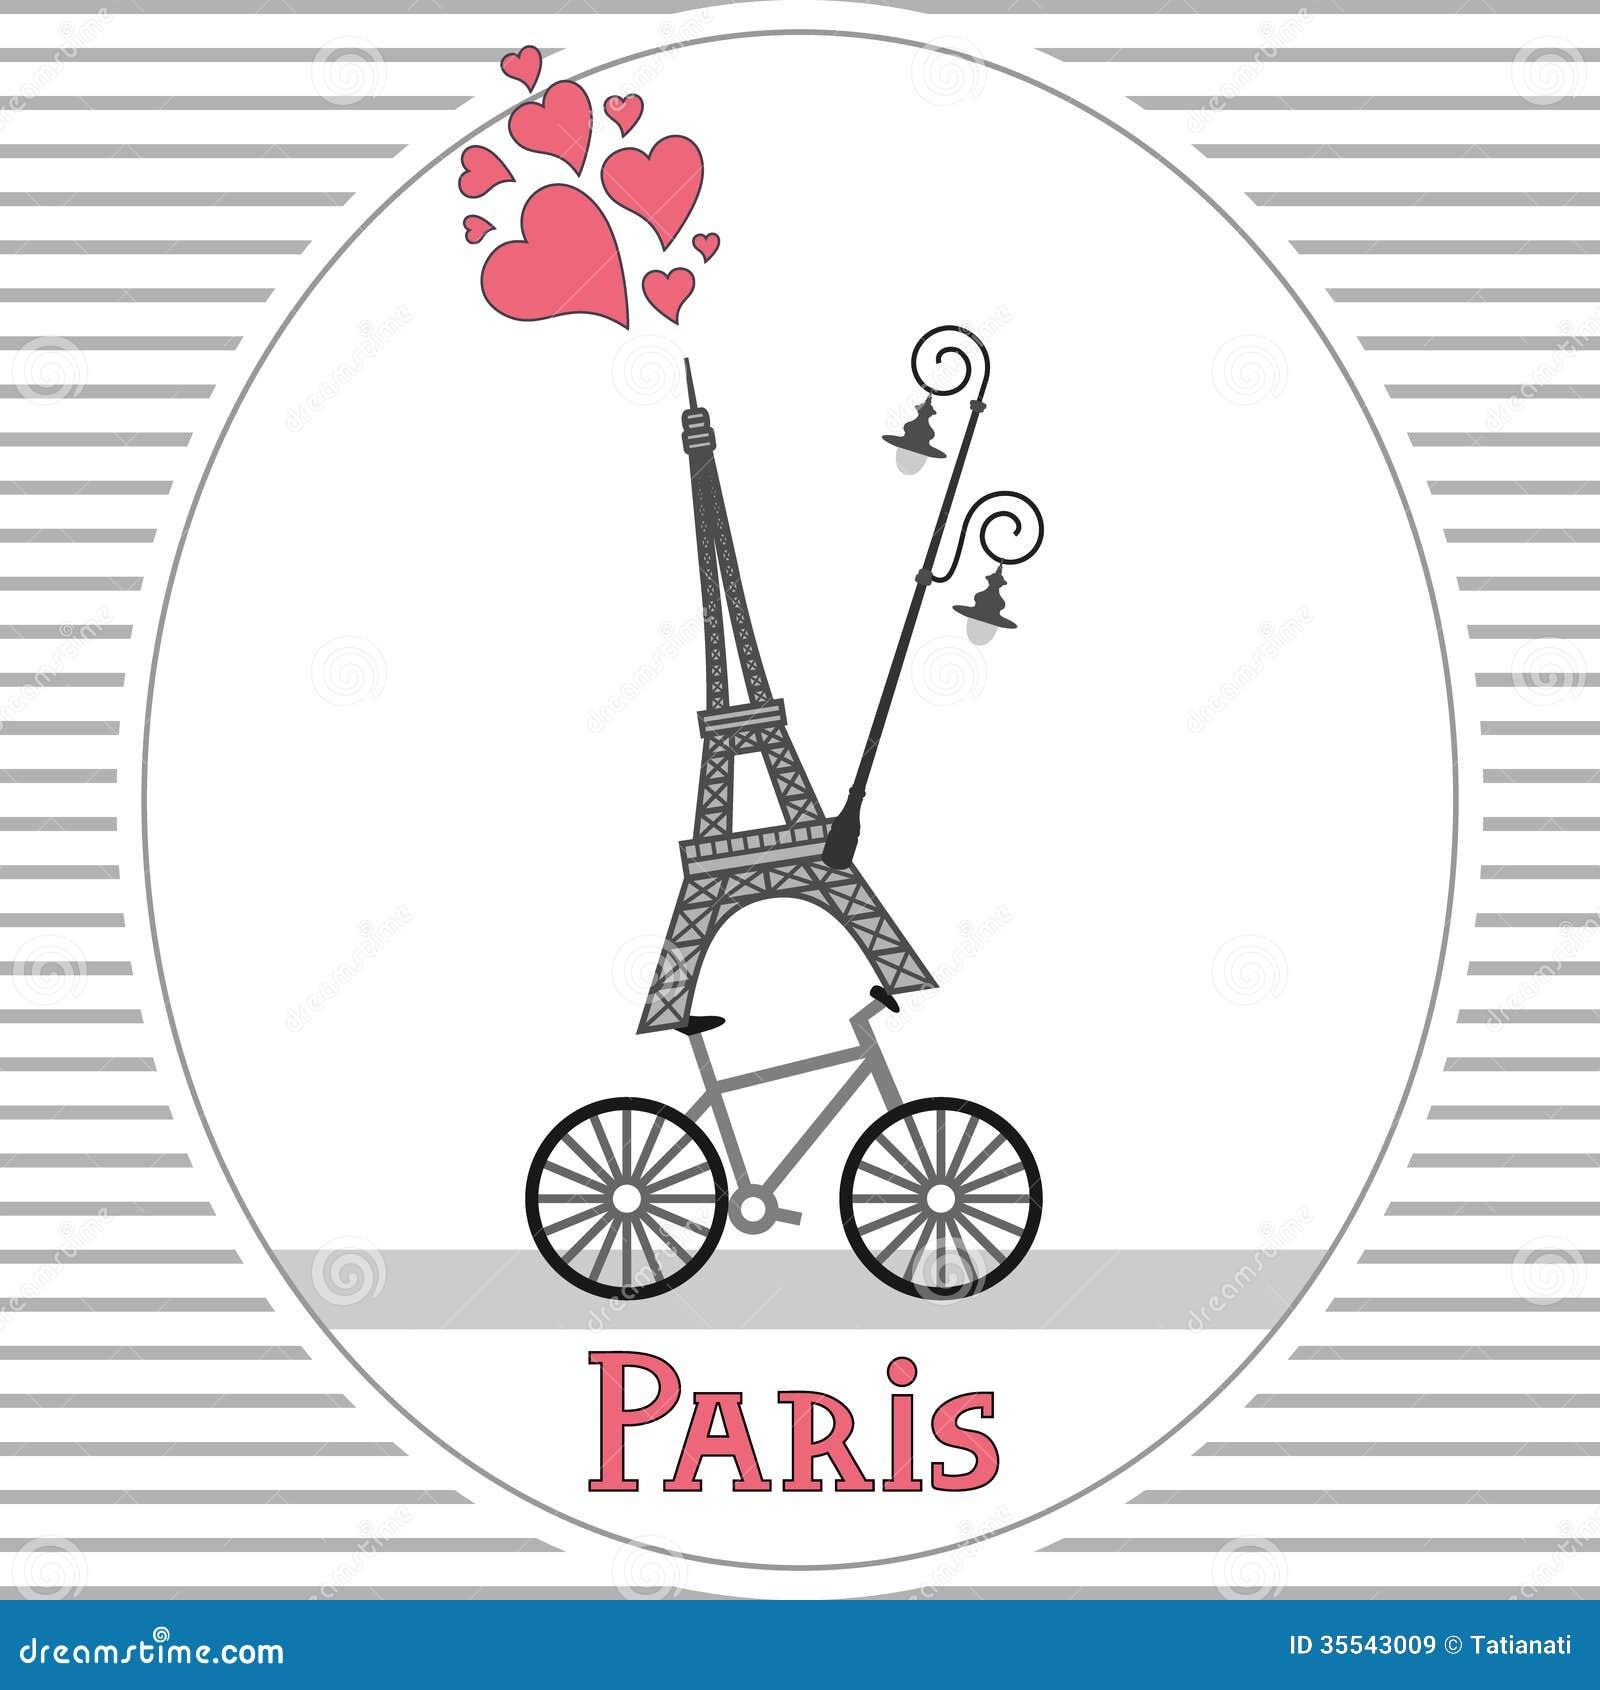 paris bike card royalty free stock images